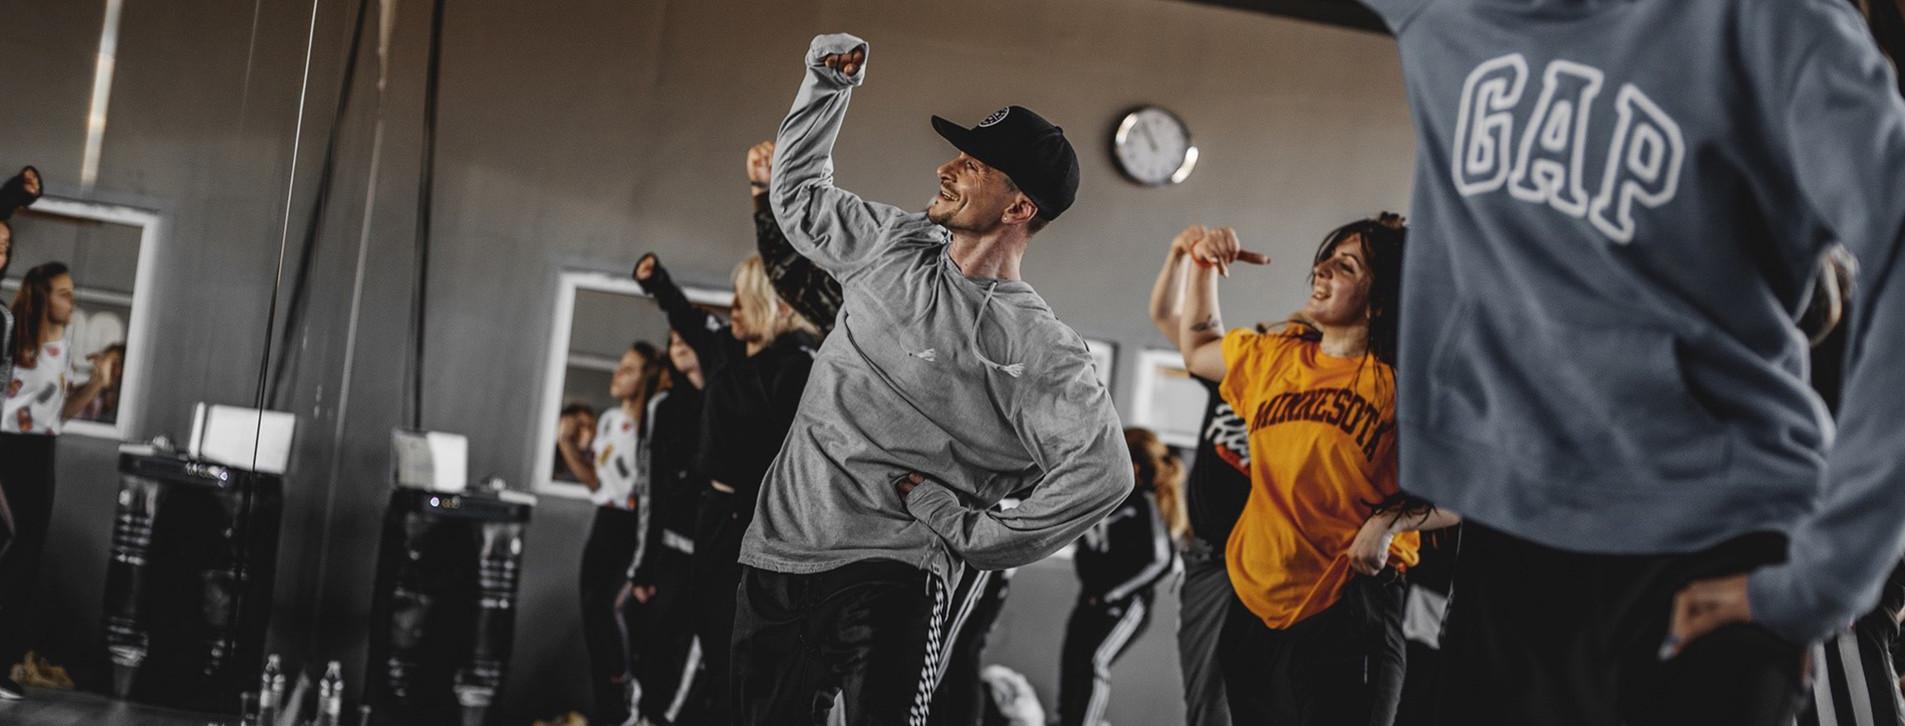 Фото 1 - Абонемент на танцы в Dance Centre Myway